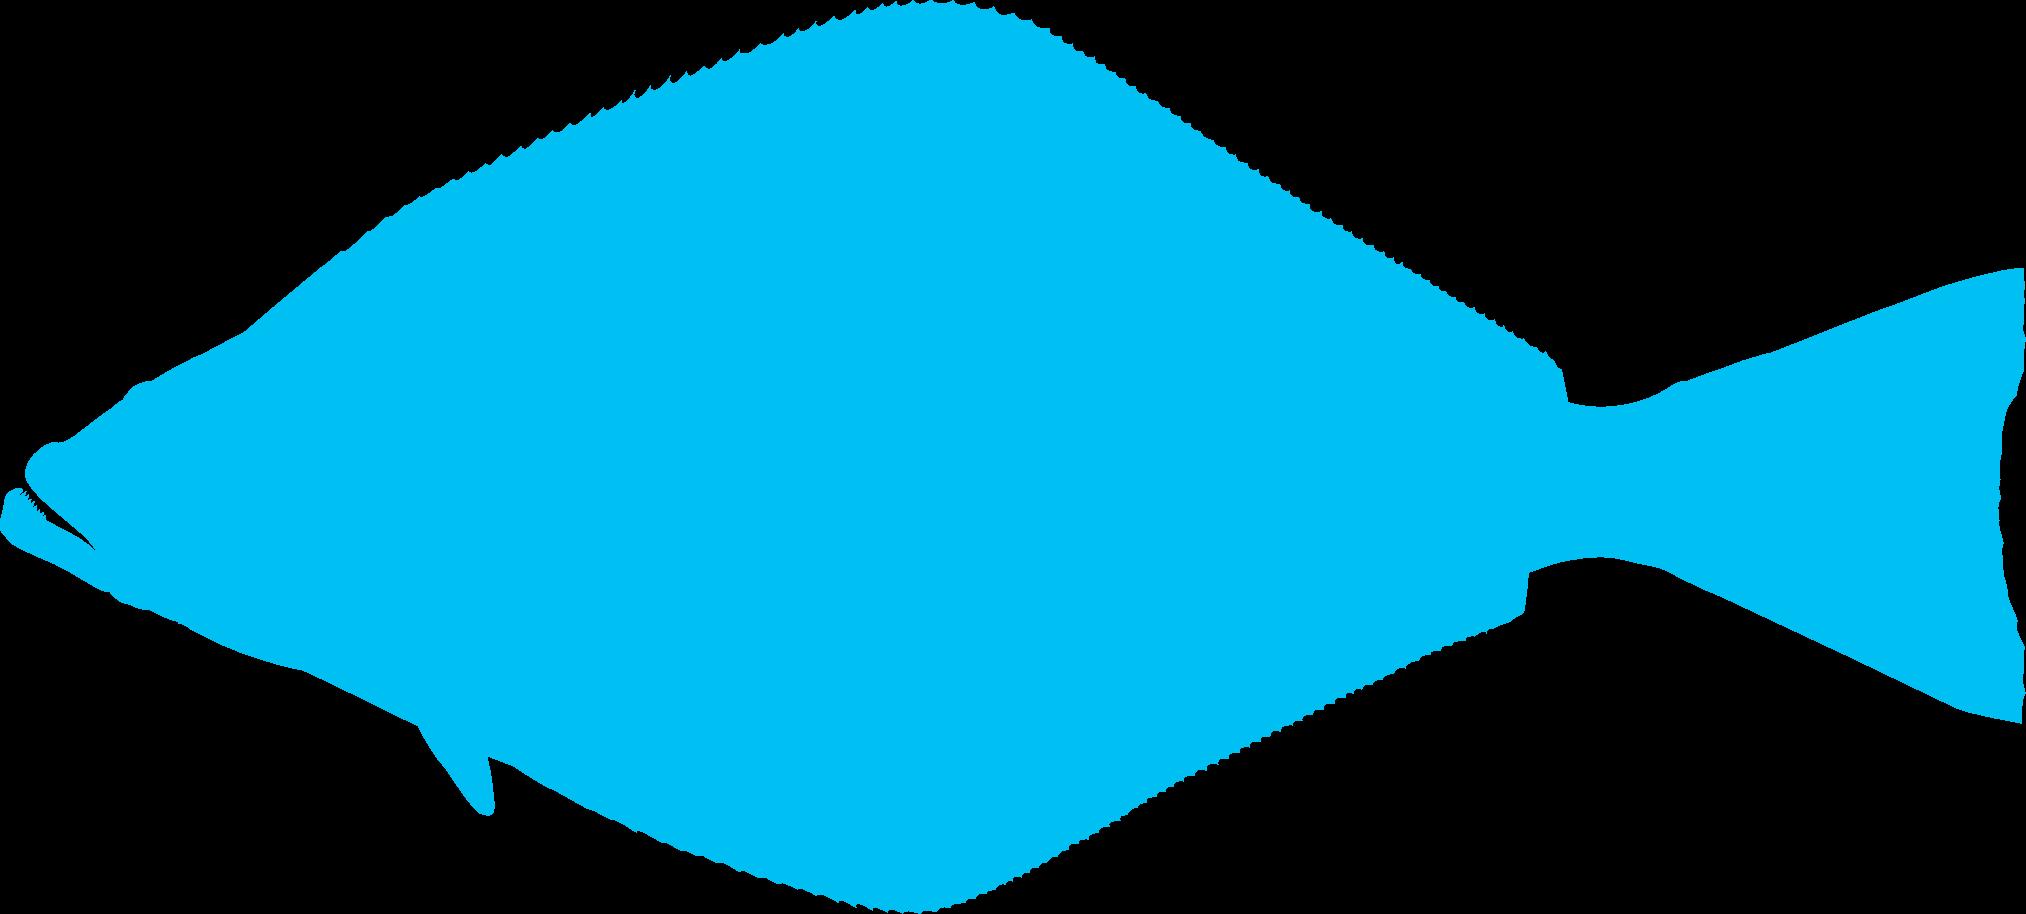 Image-Fish-halibut-shape